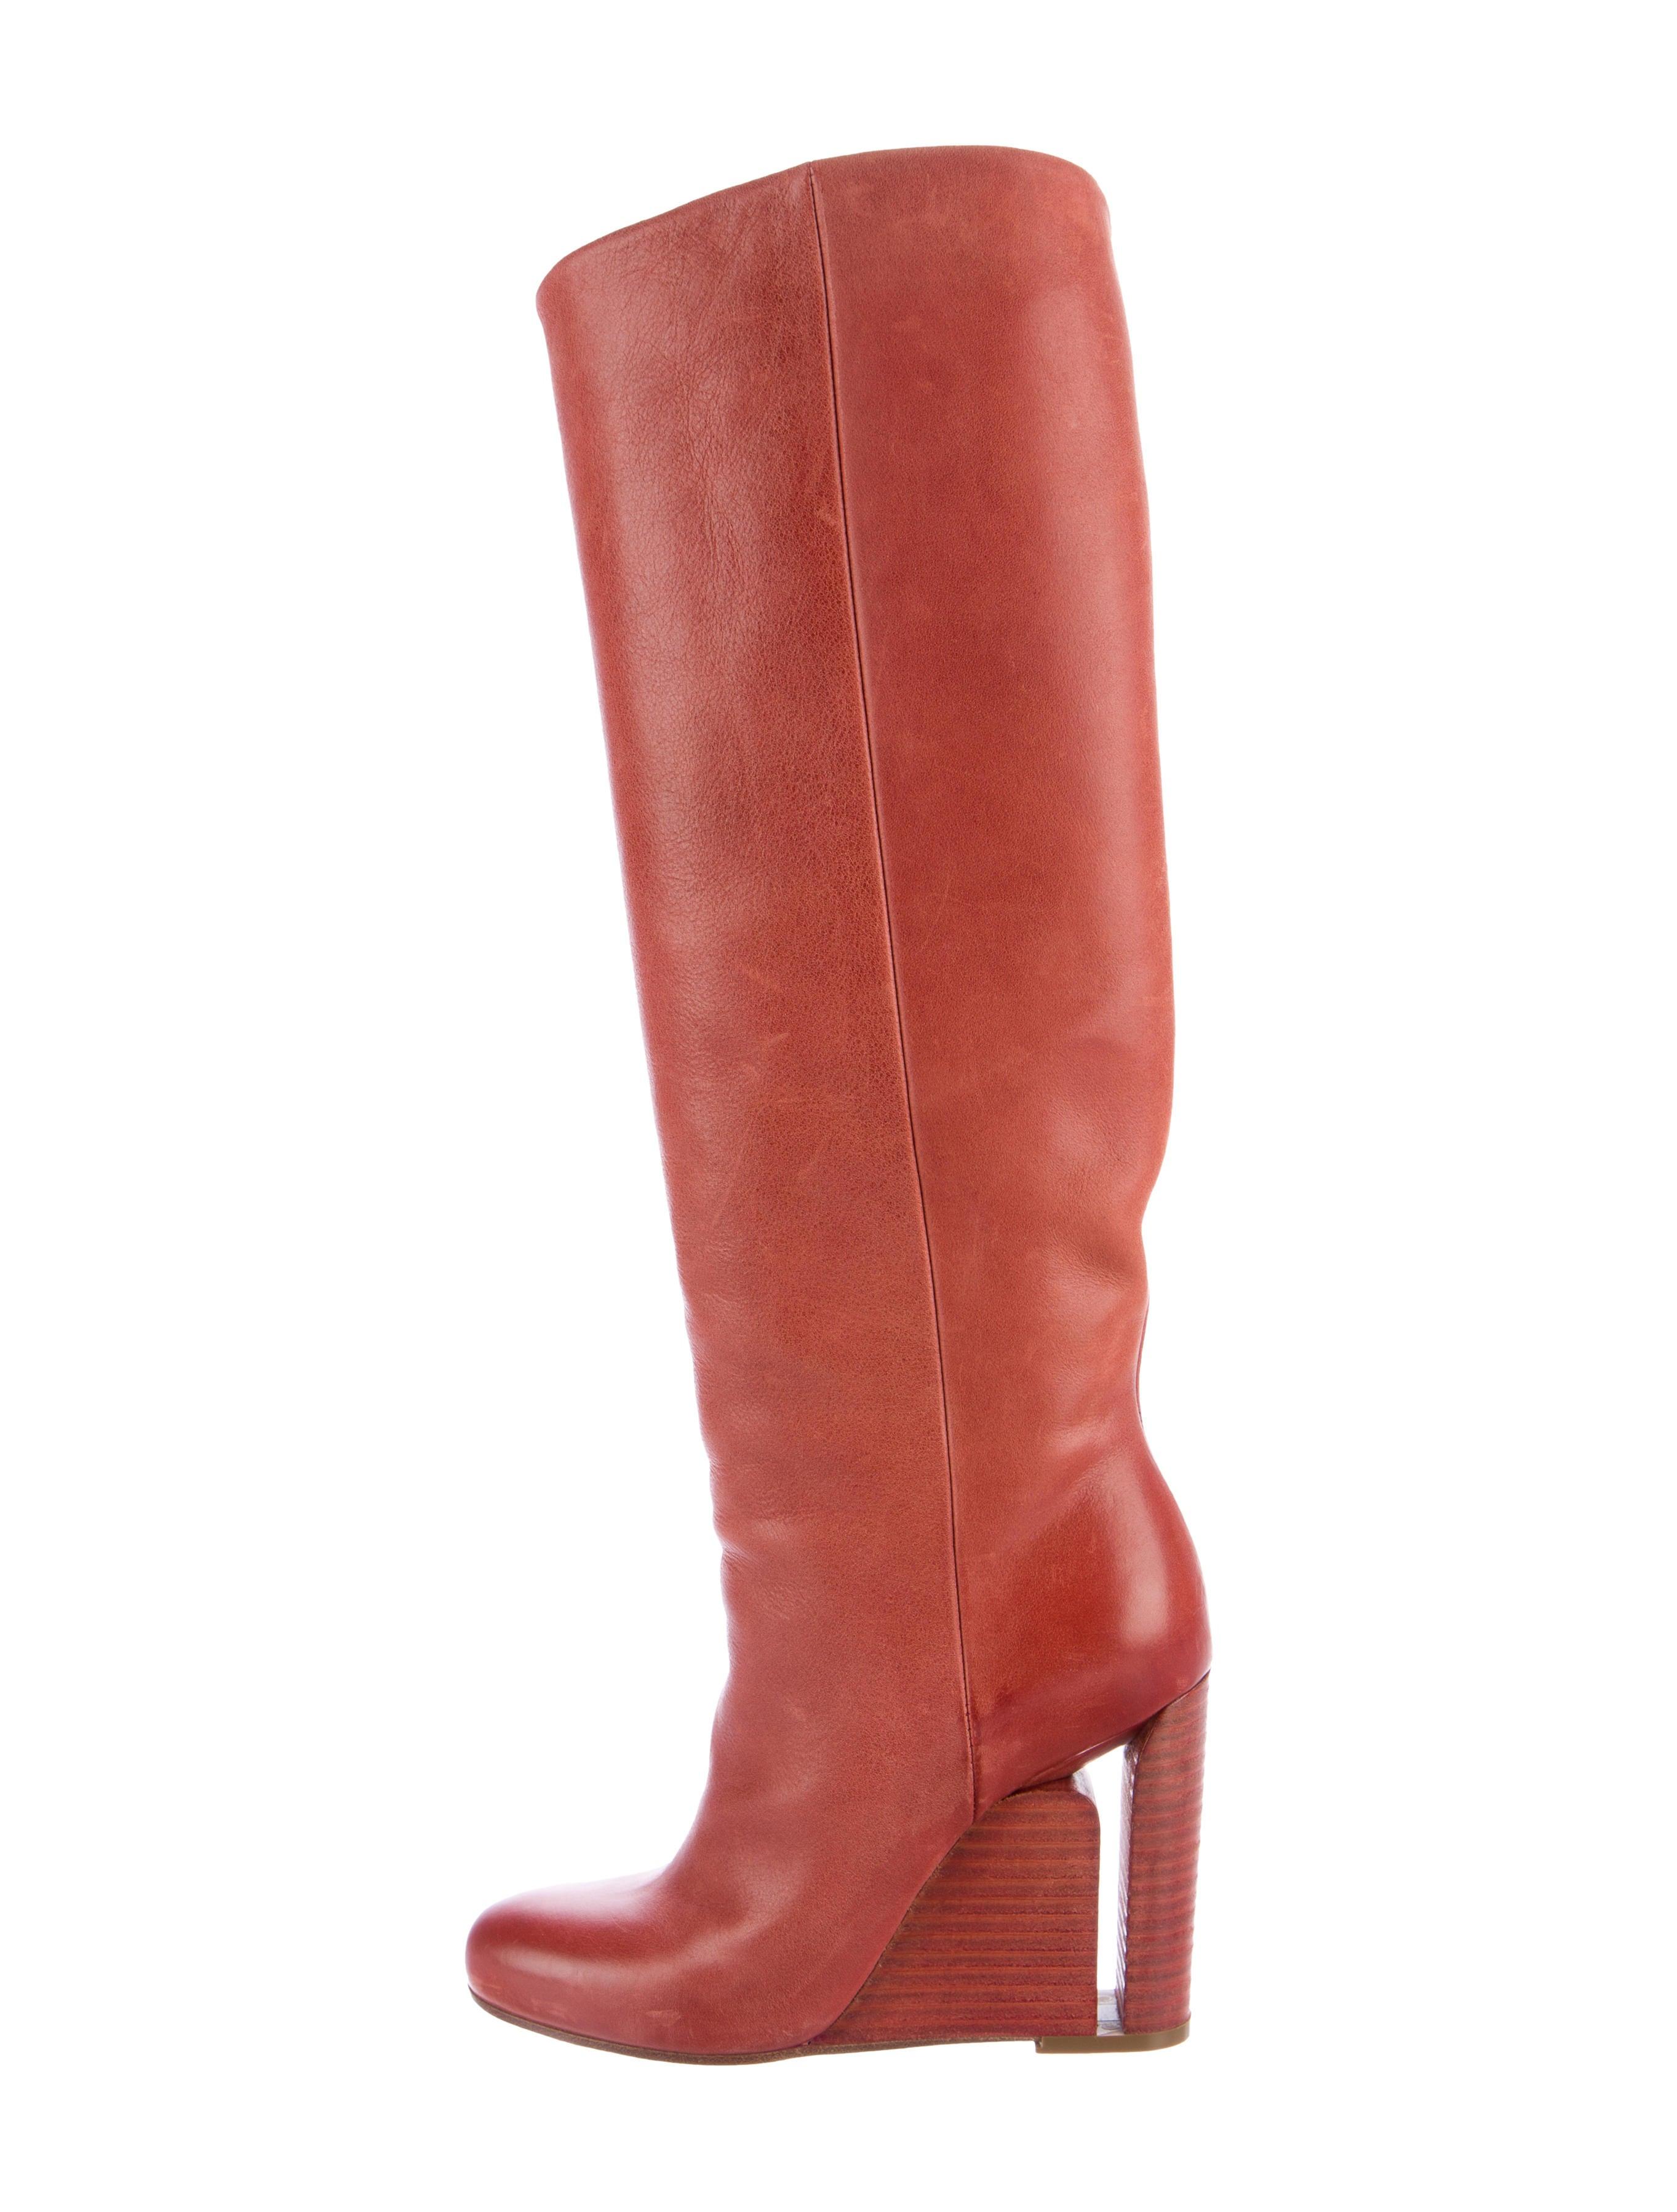 maison martin margiela leather knee high boots shoes